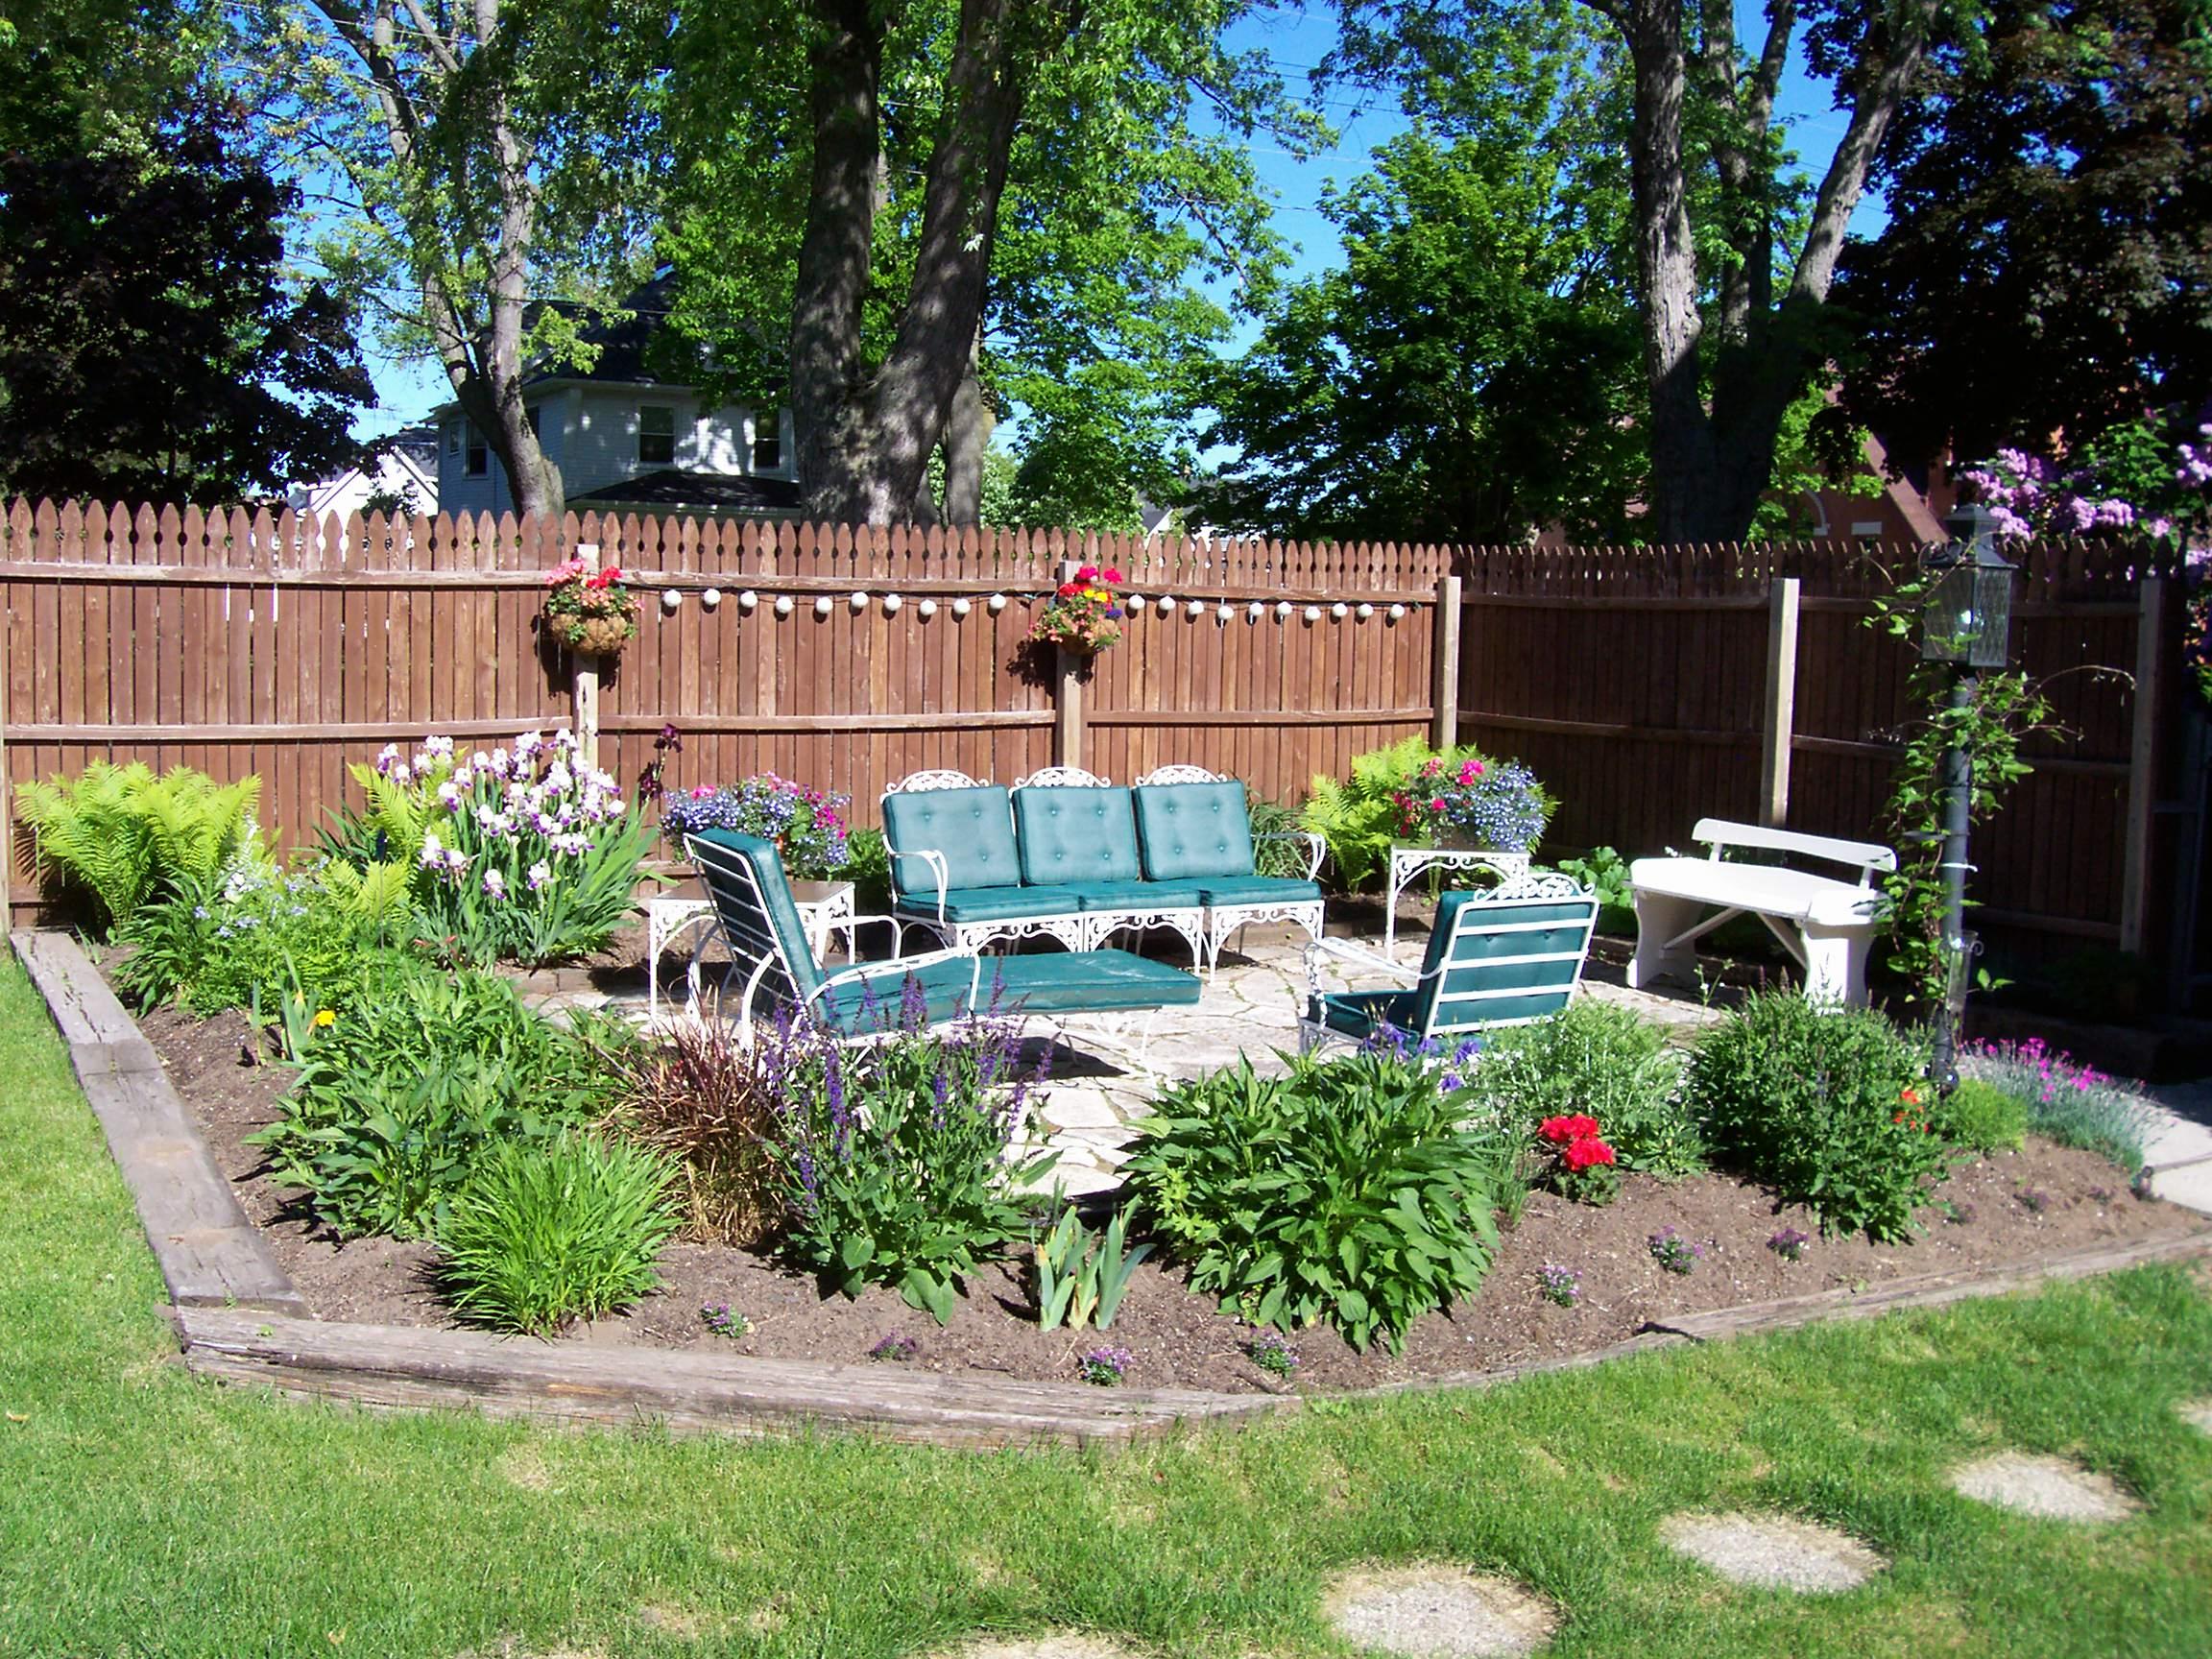 Backyard Garden Center Arcadia Wi - Garden Design on Arcadia Backyard Designs id=31643